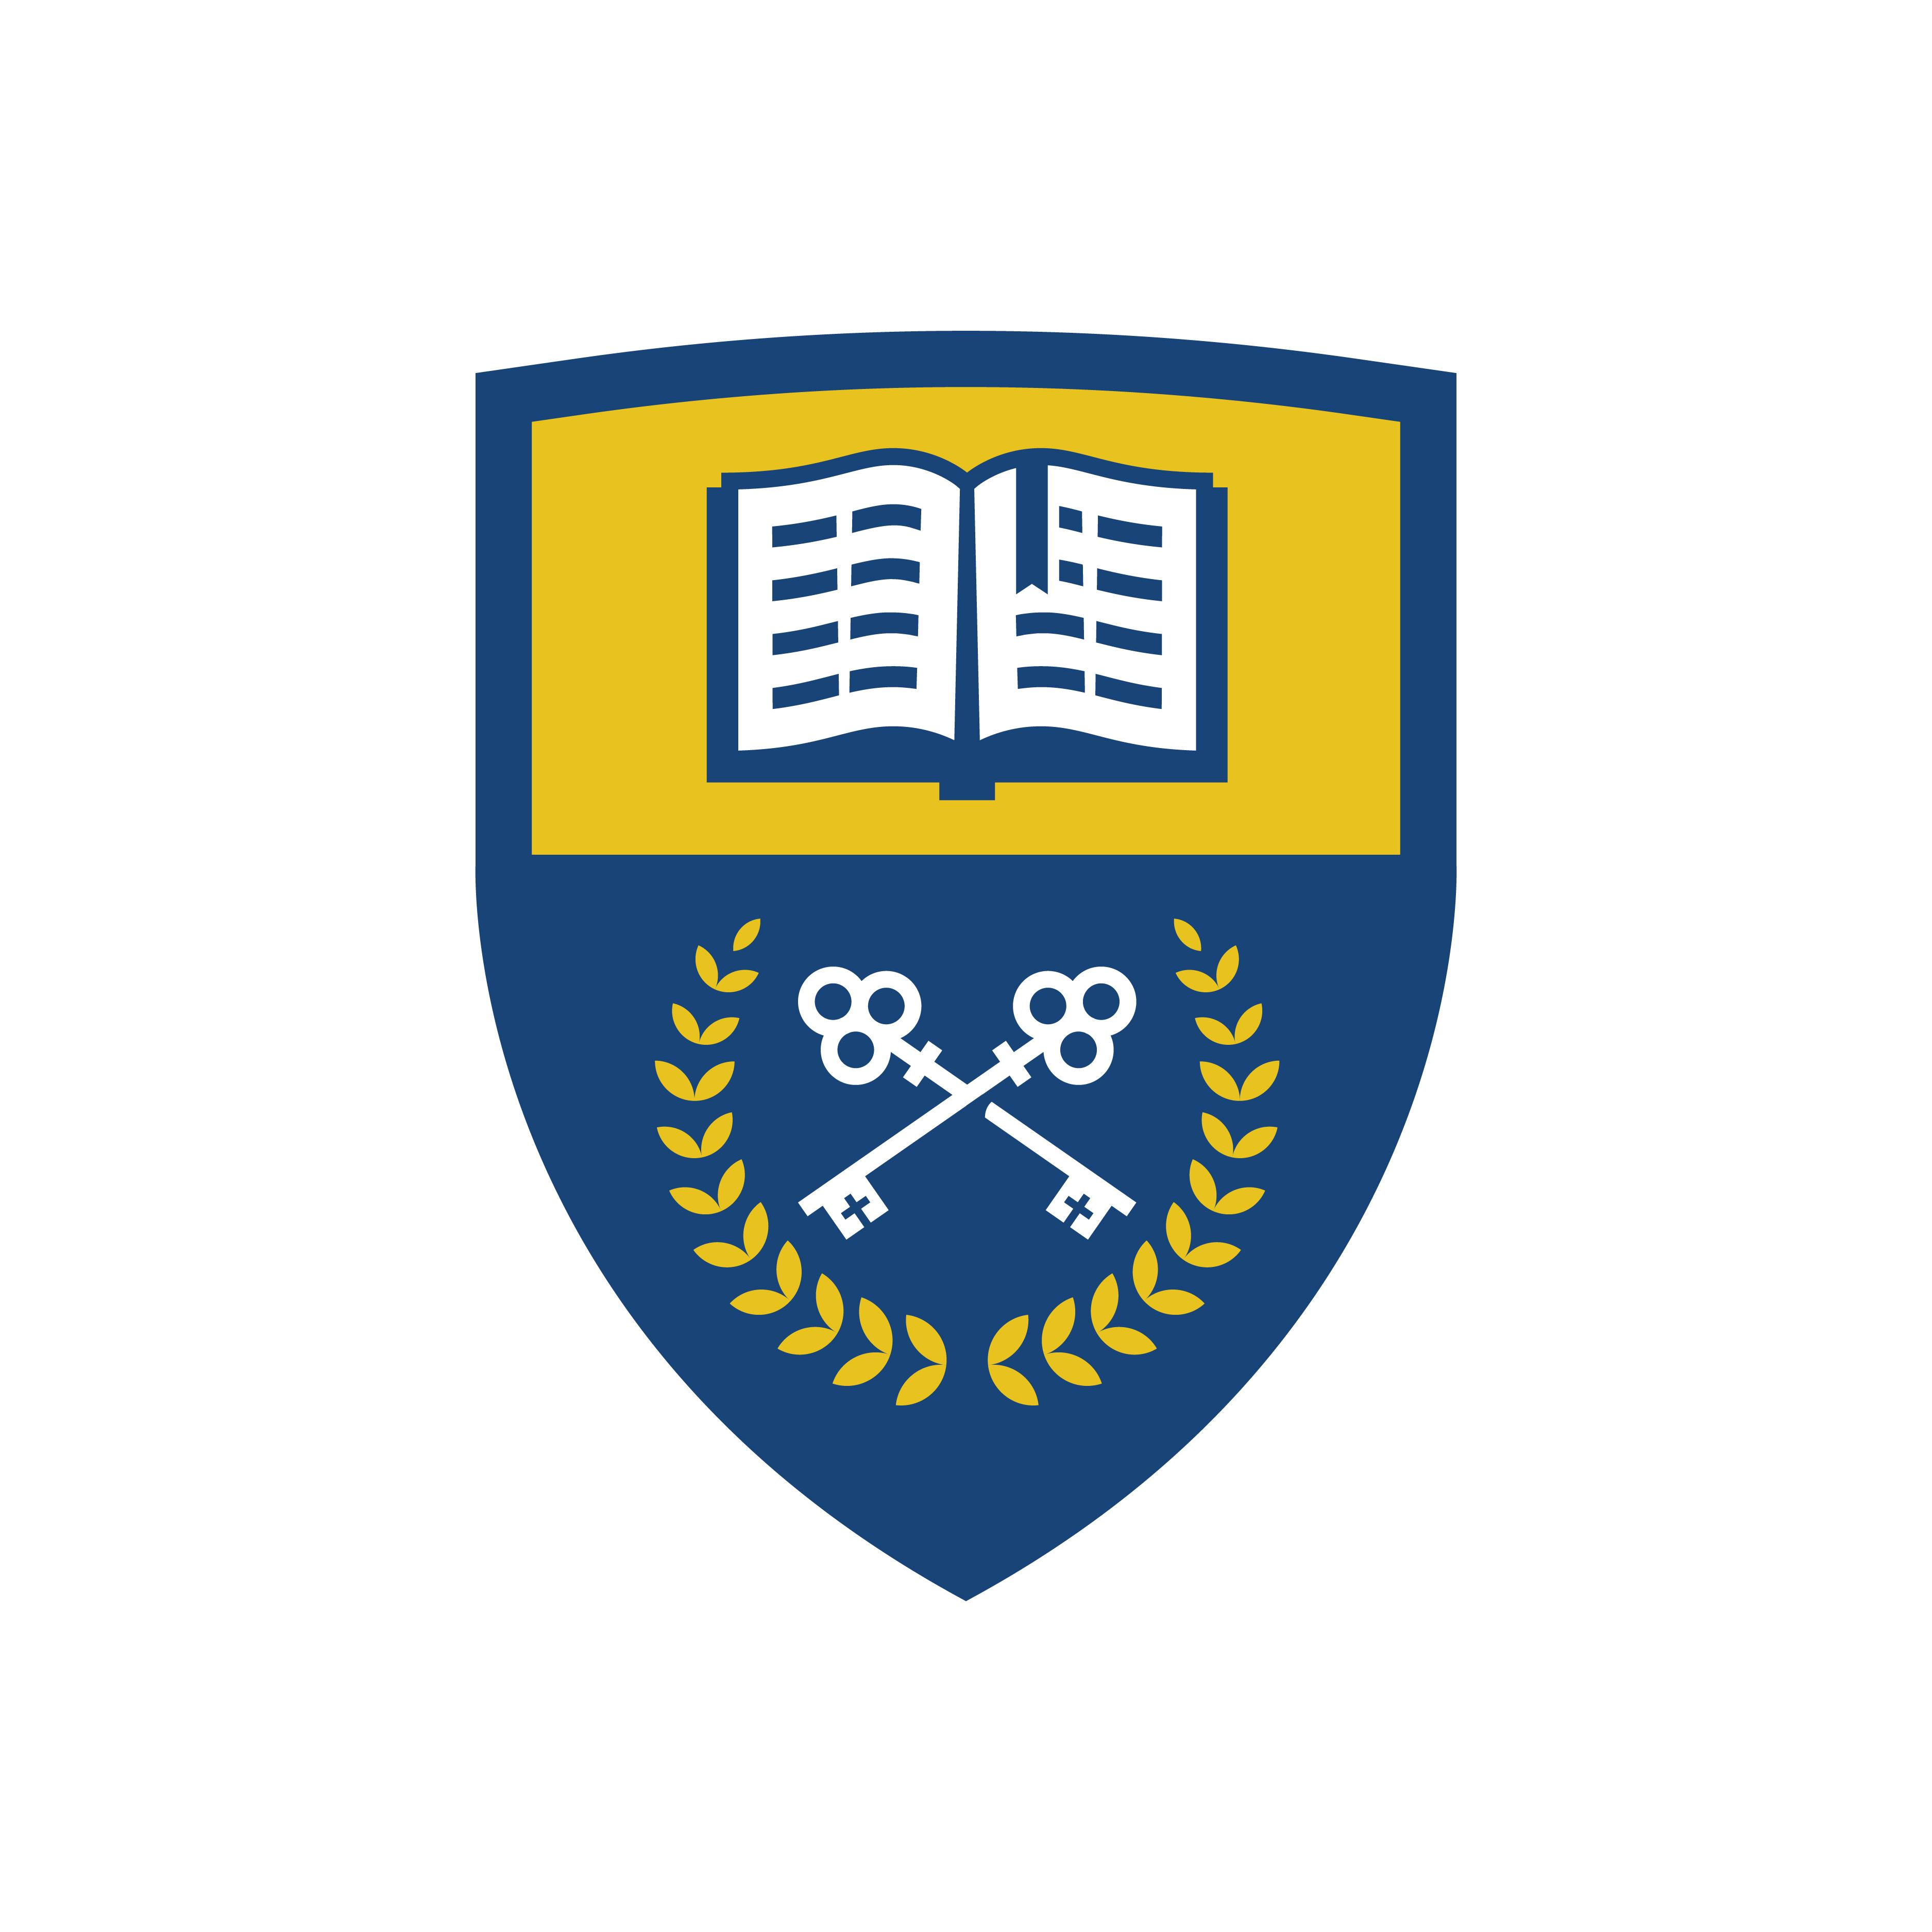 Veritas Academy - Crest logo design by logo designer Wandel Design for your inspiration and for the worlds largest logo competition